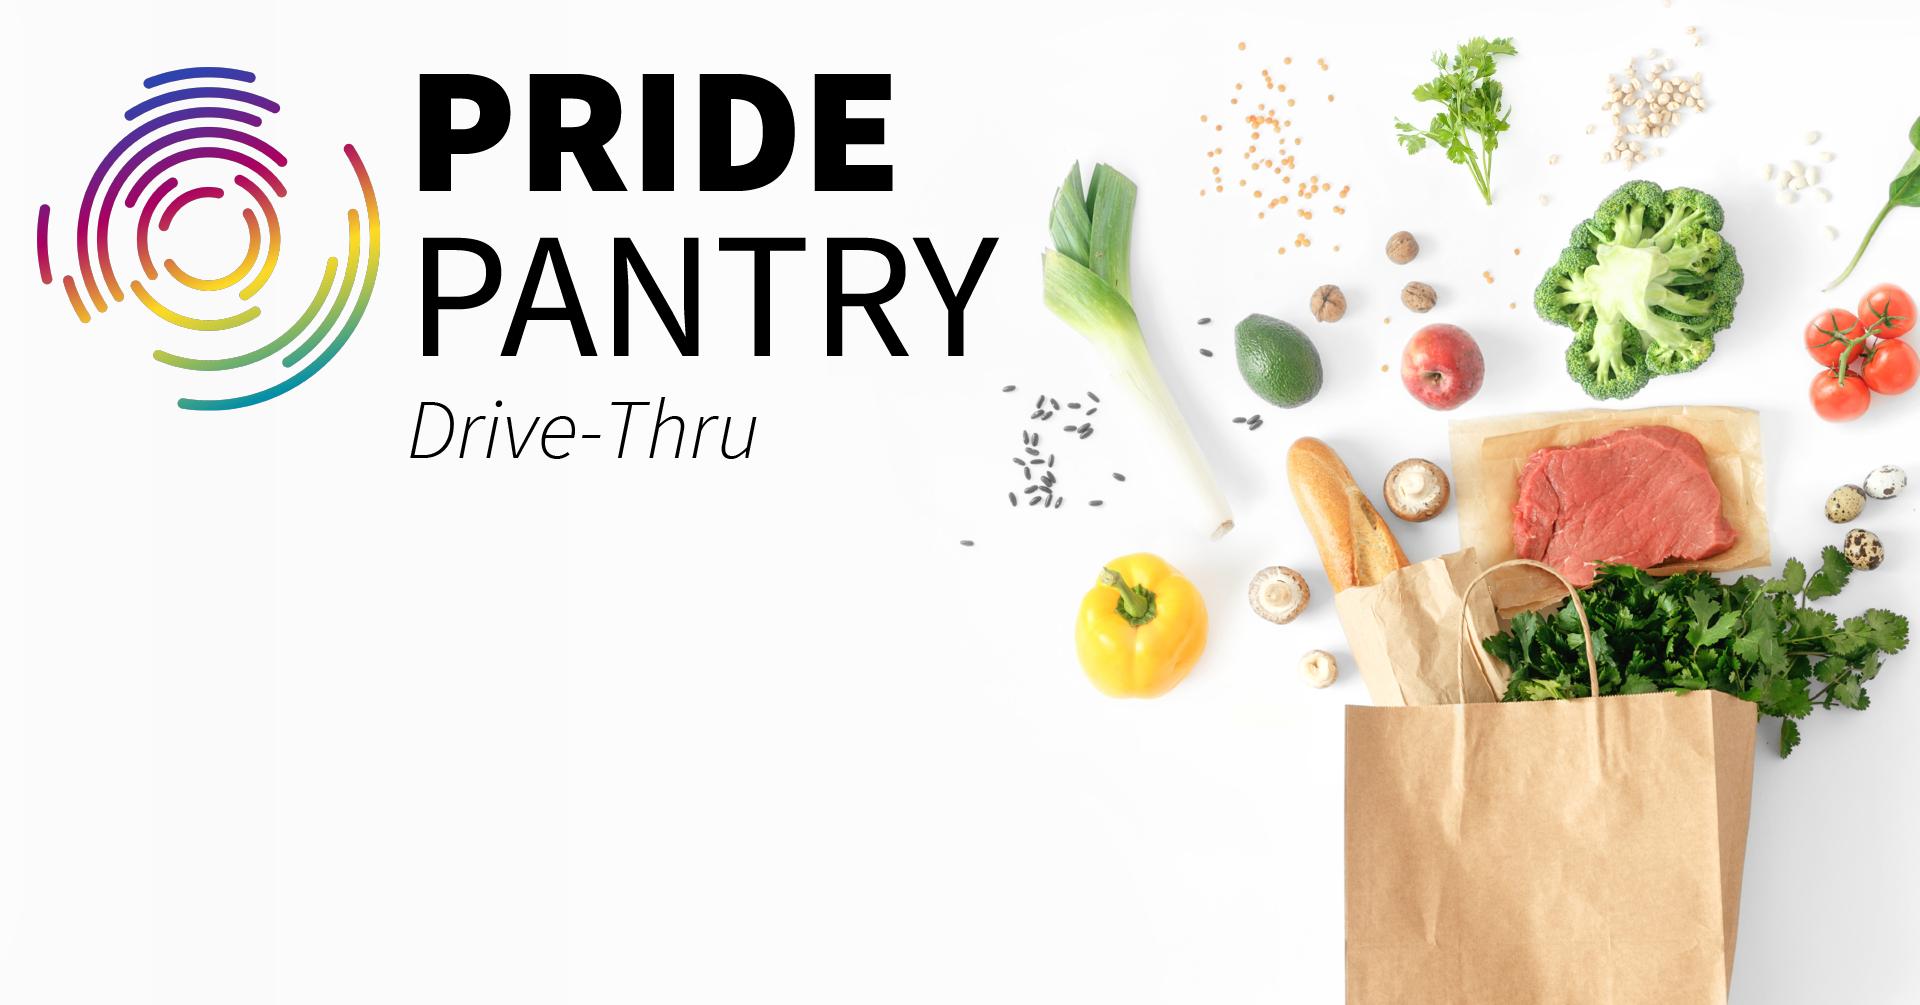 Food assistance, LGBT Life Center